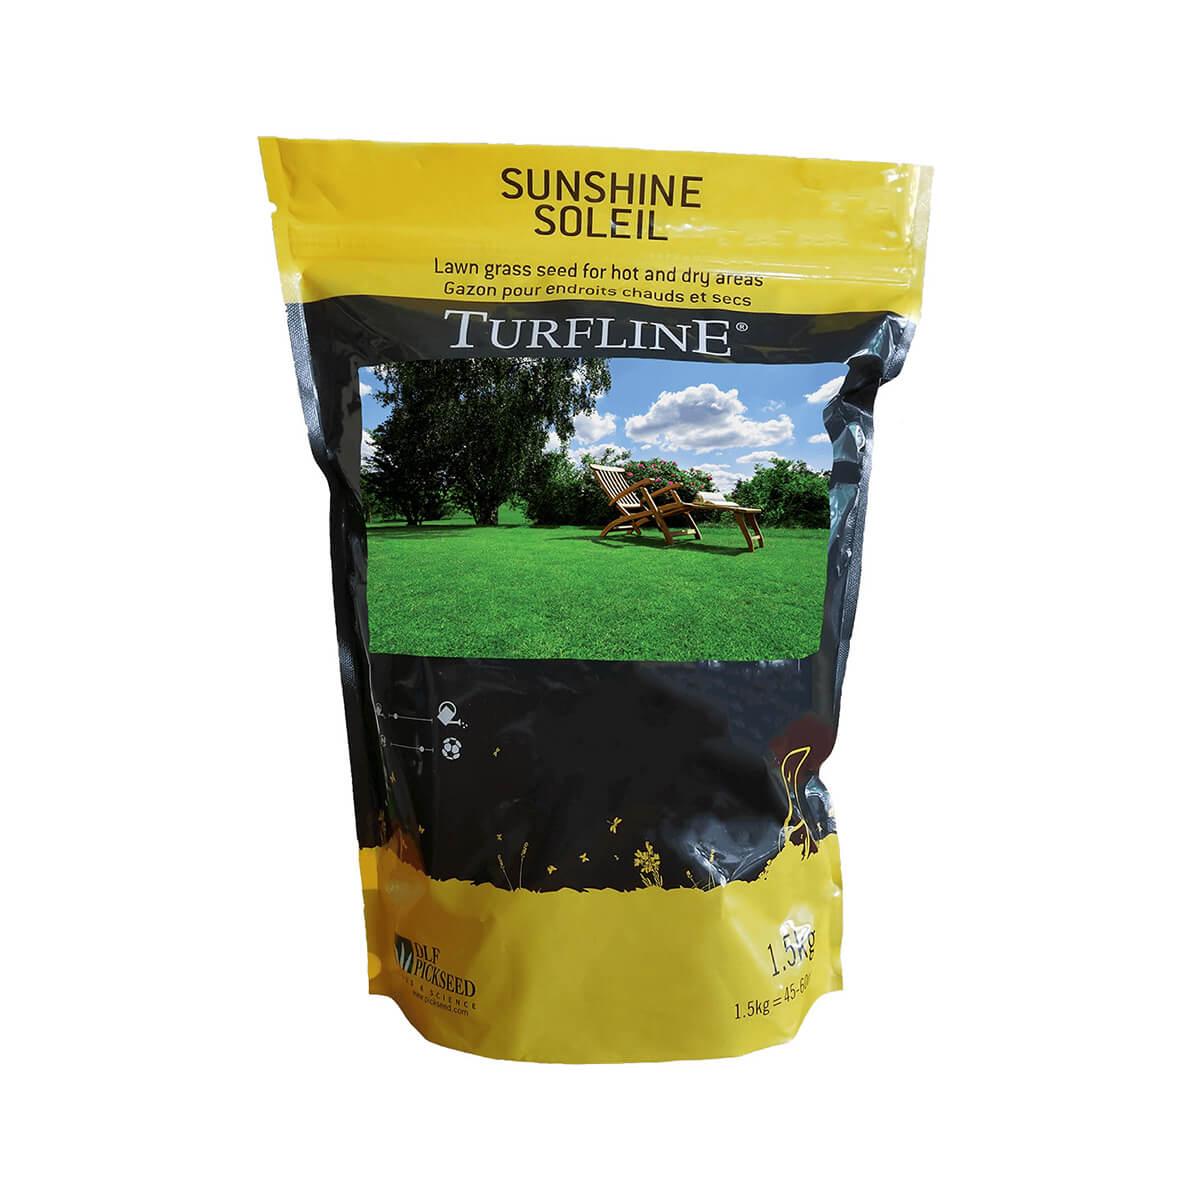 Turfline Sunshine Mix - 1.5 kg bag